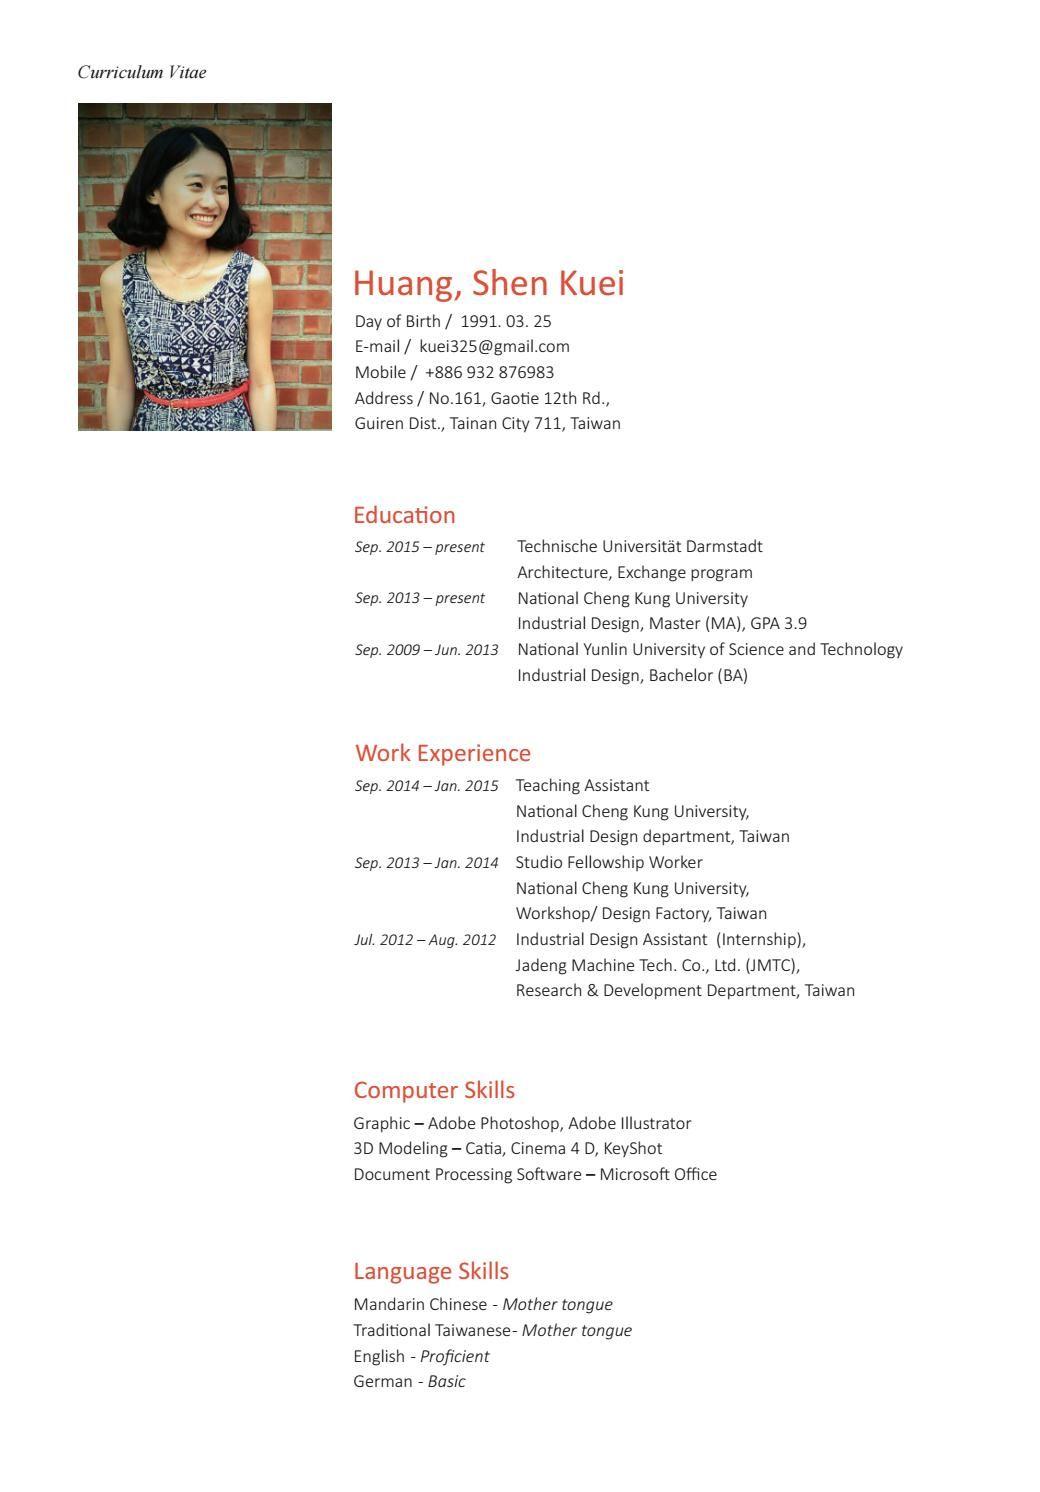 Shen Kuei Huang_Portfolio Portfolio, Curriculum